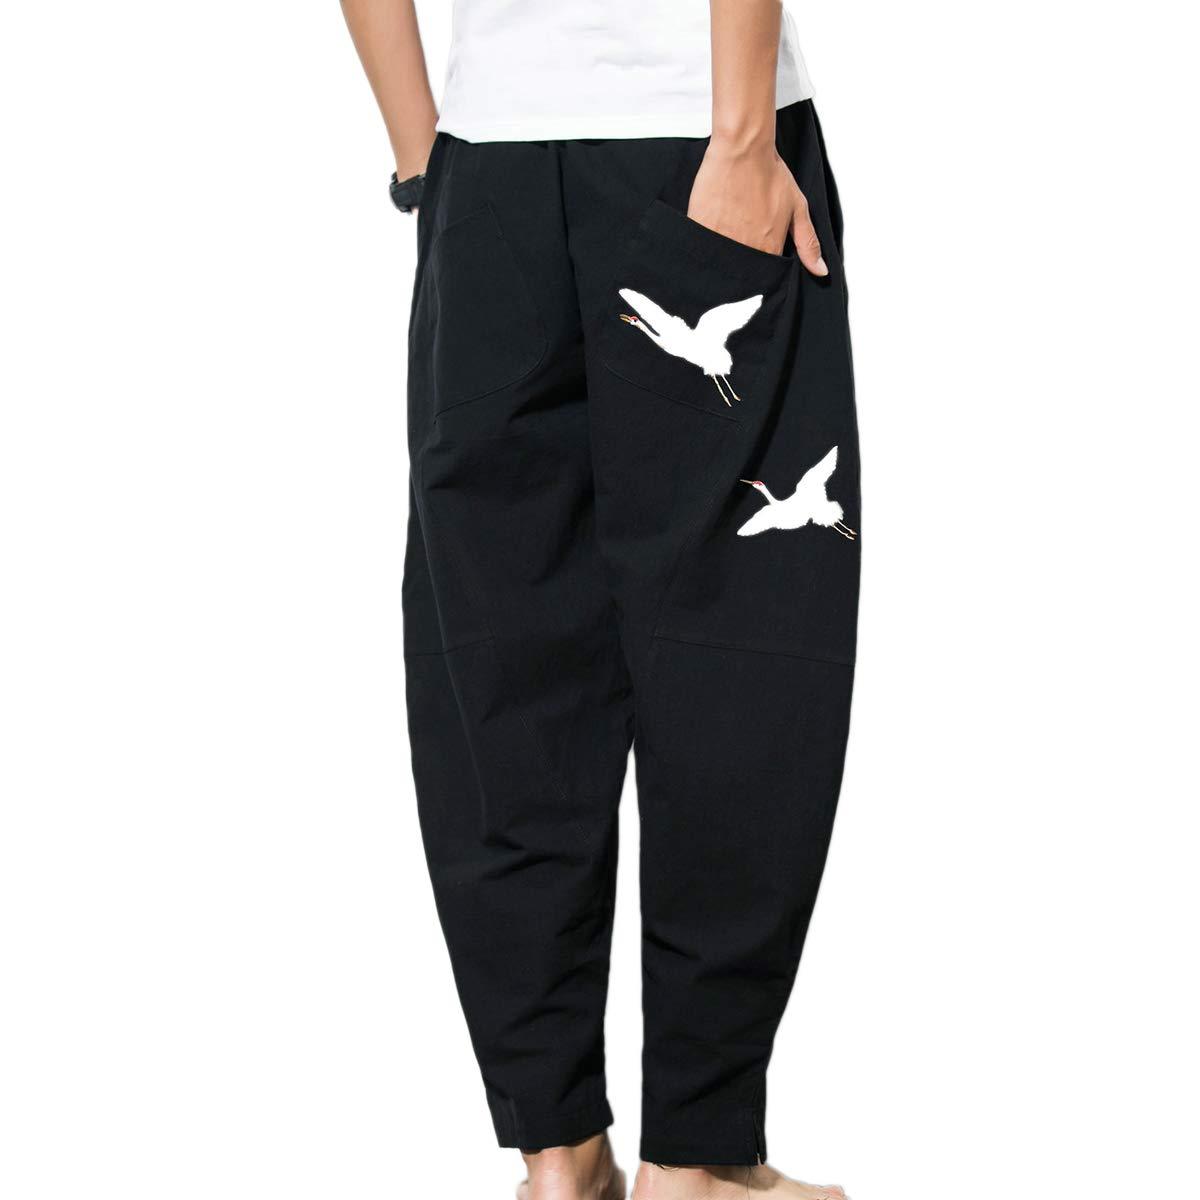 HORZEE Mens Baggy Harem Pants Casual Elastic Waist Cotton Blends Linen Pants